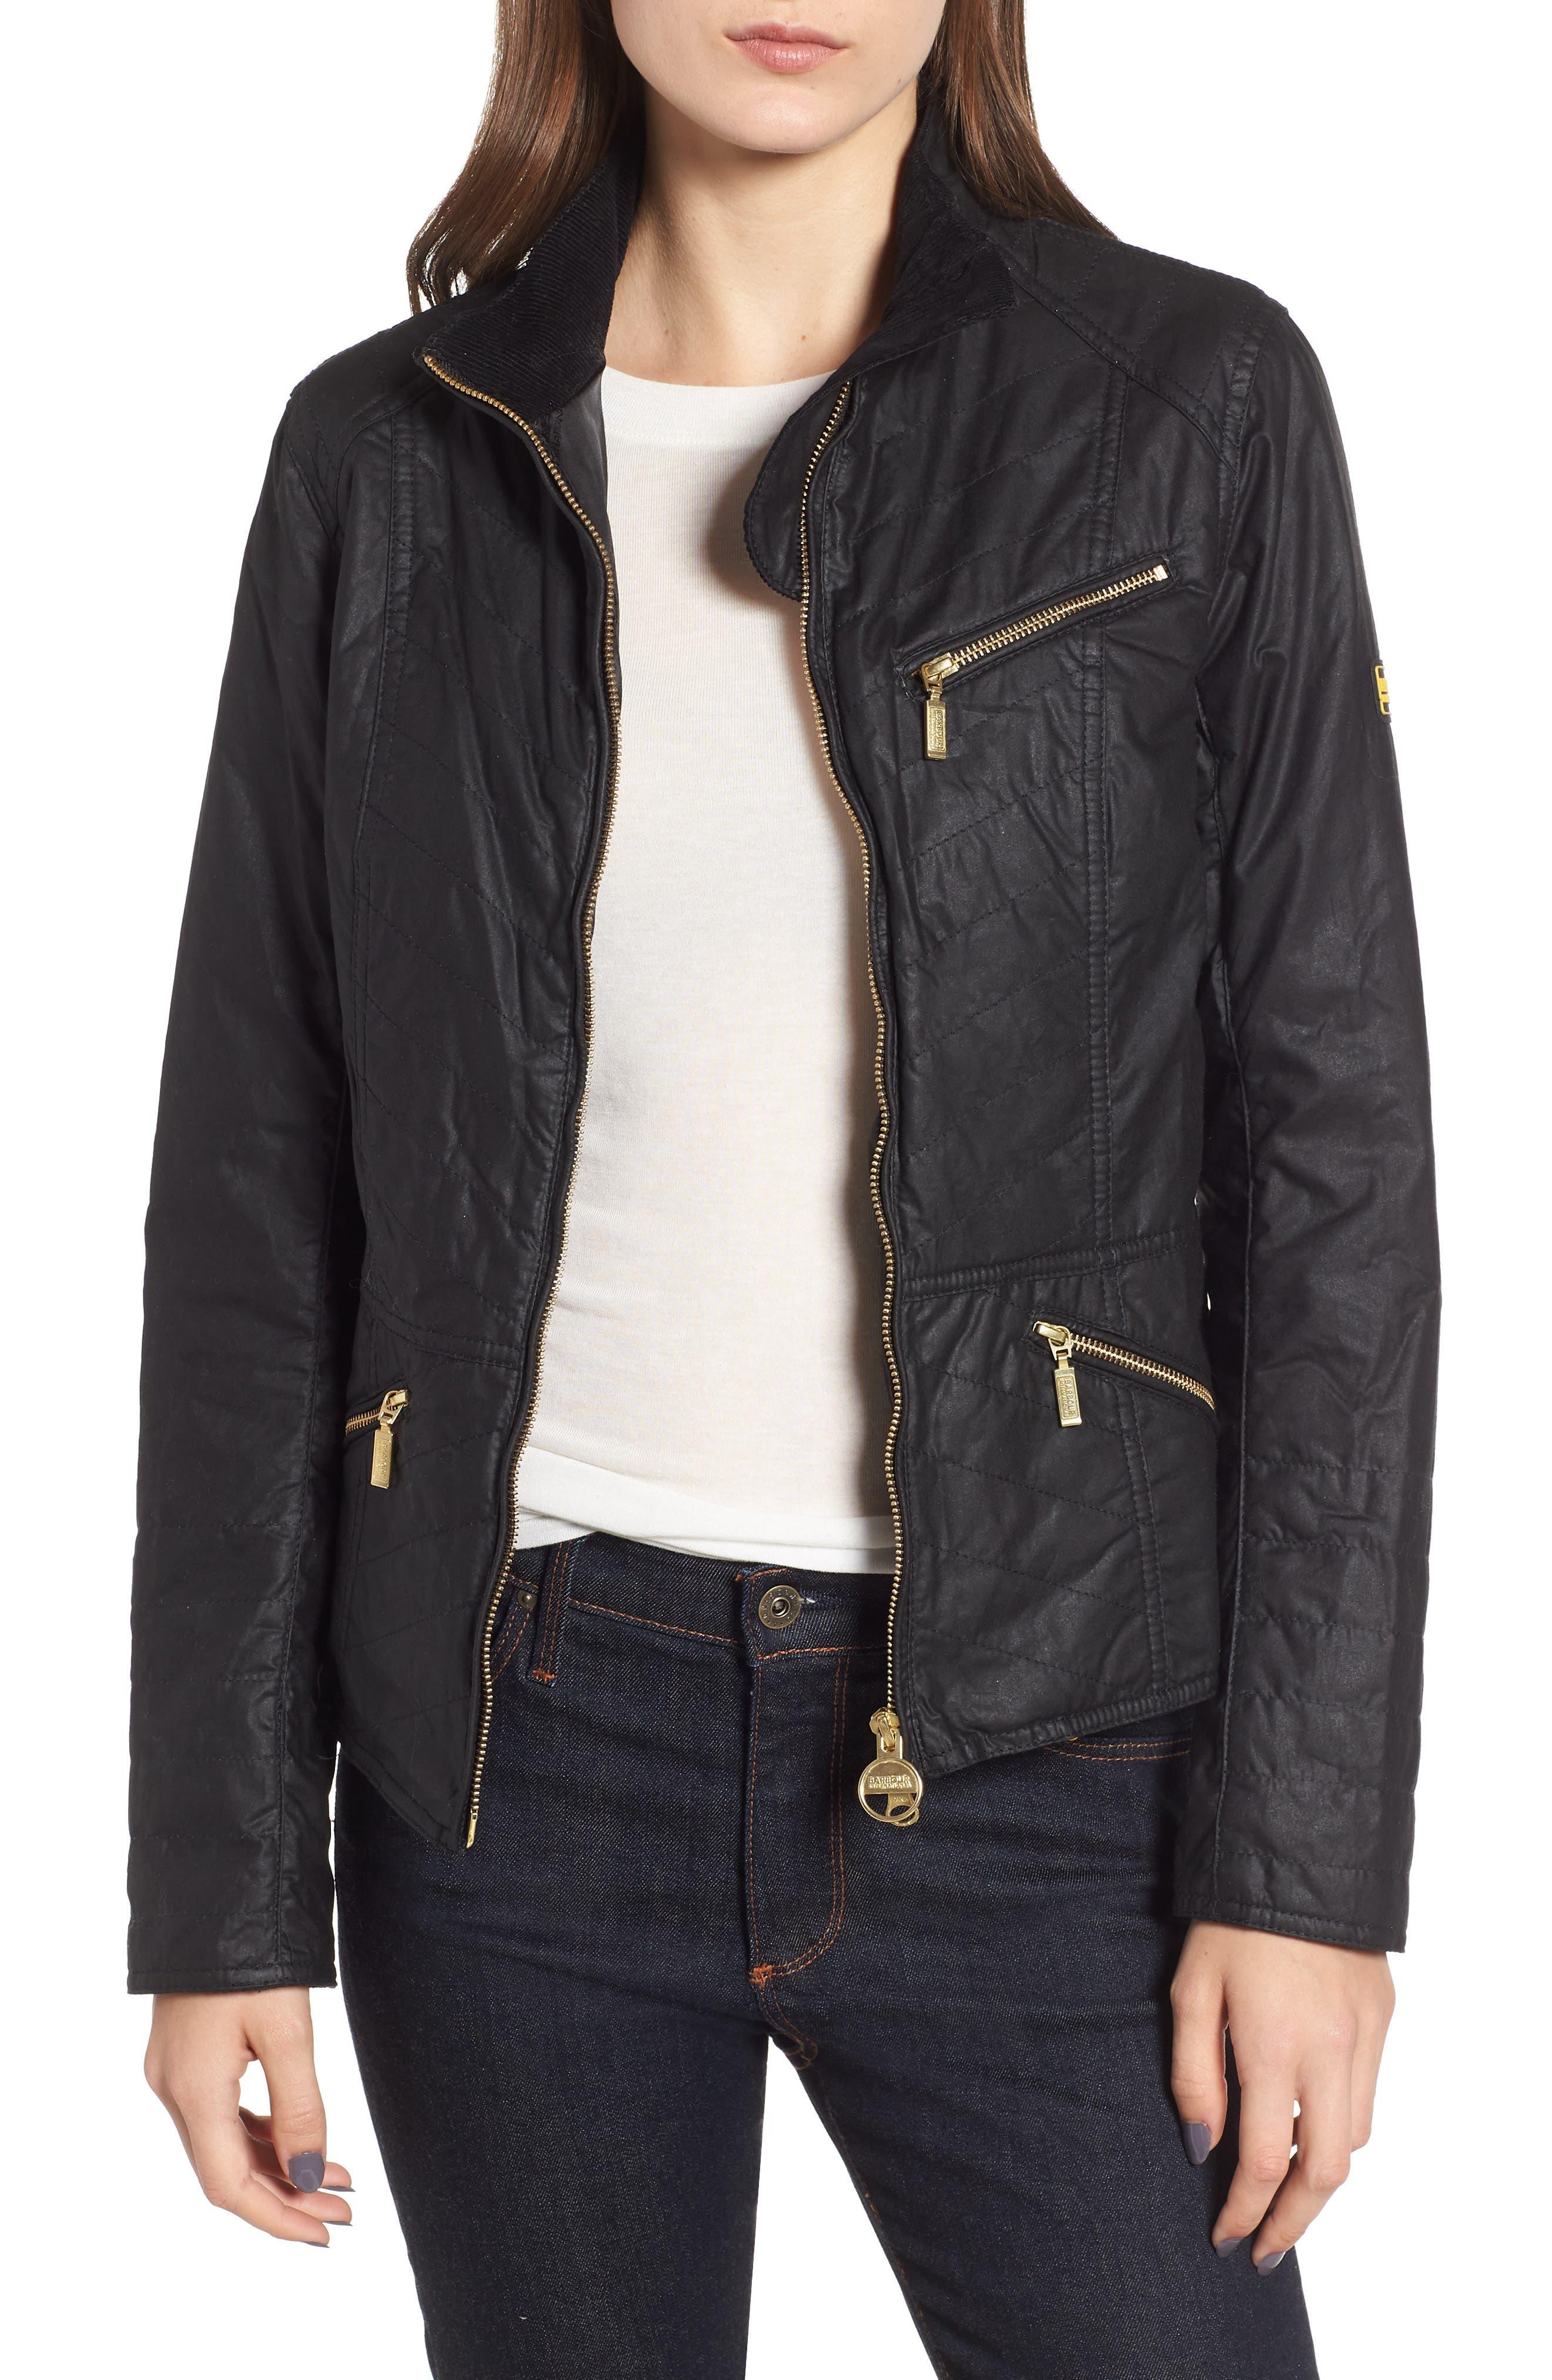 Barbour Backmarker Water Resistant Waxed Cotton Jacket, US / 8 UK - Black